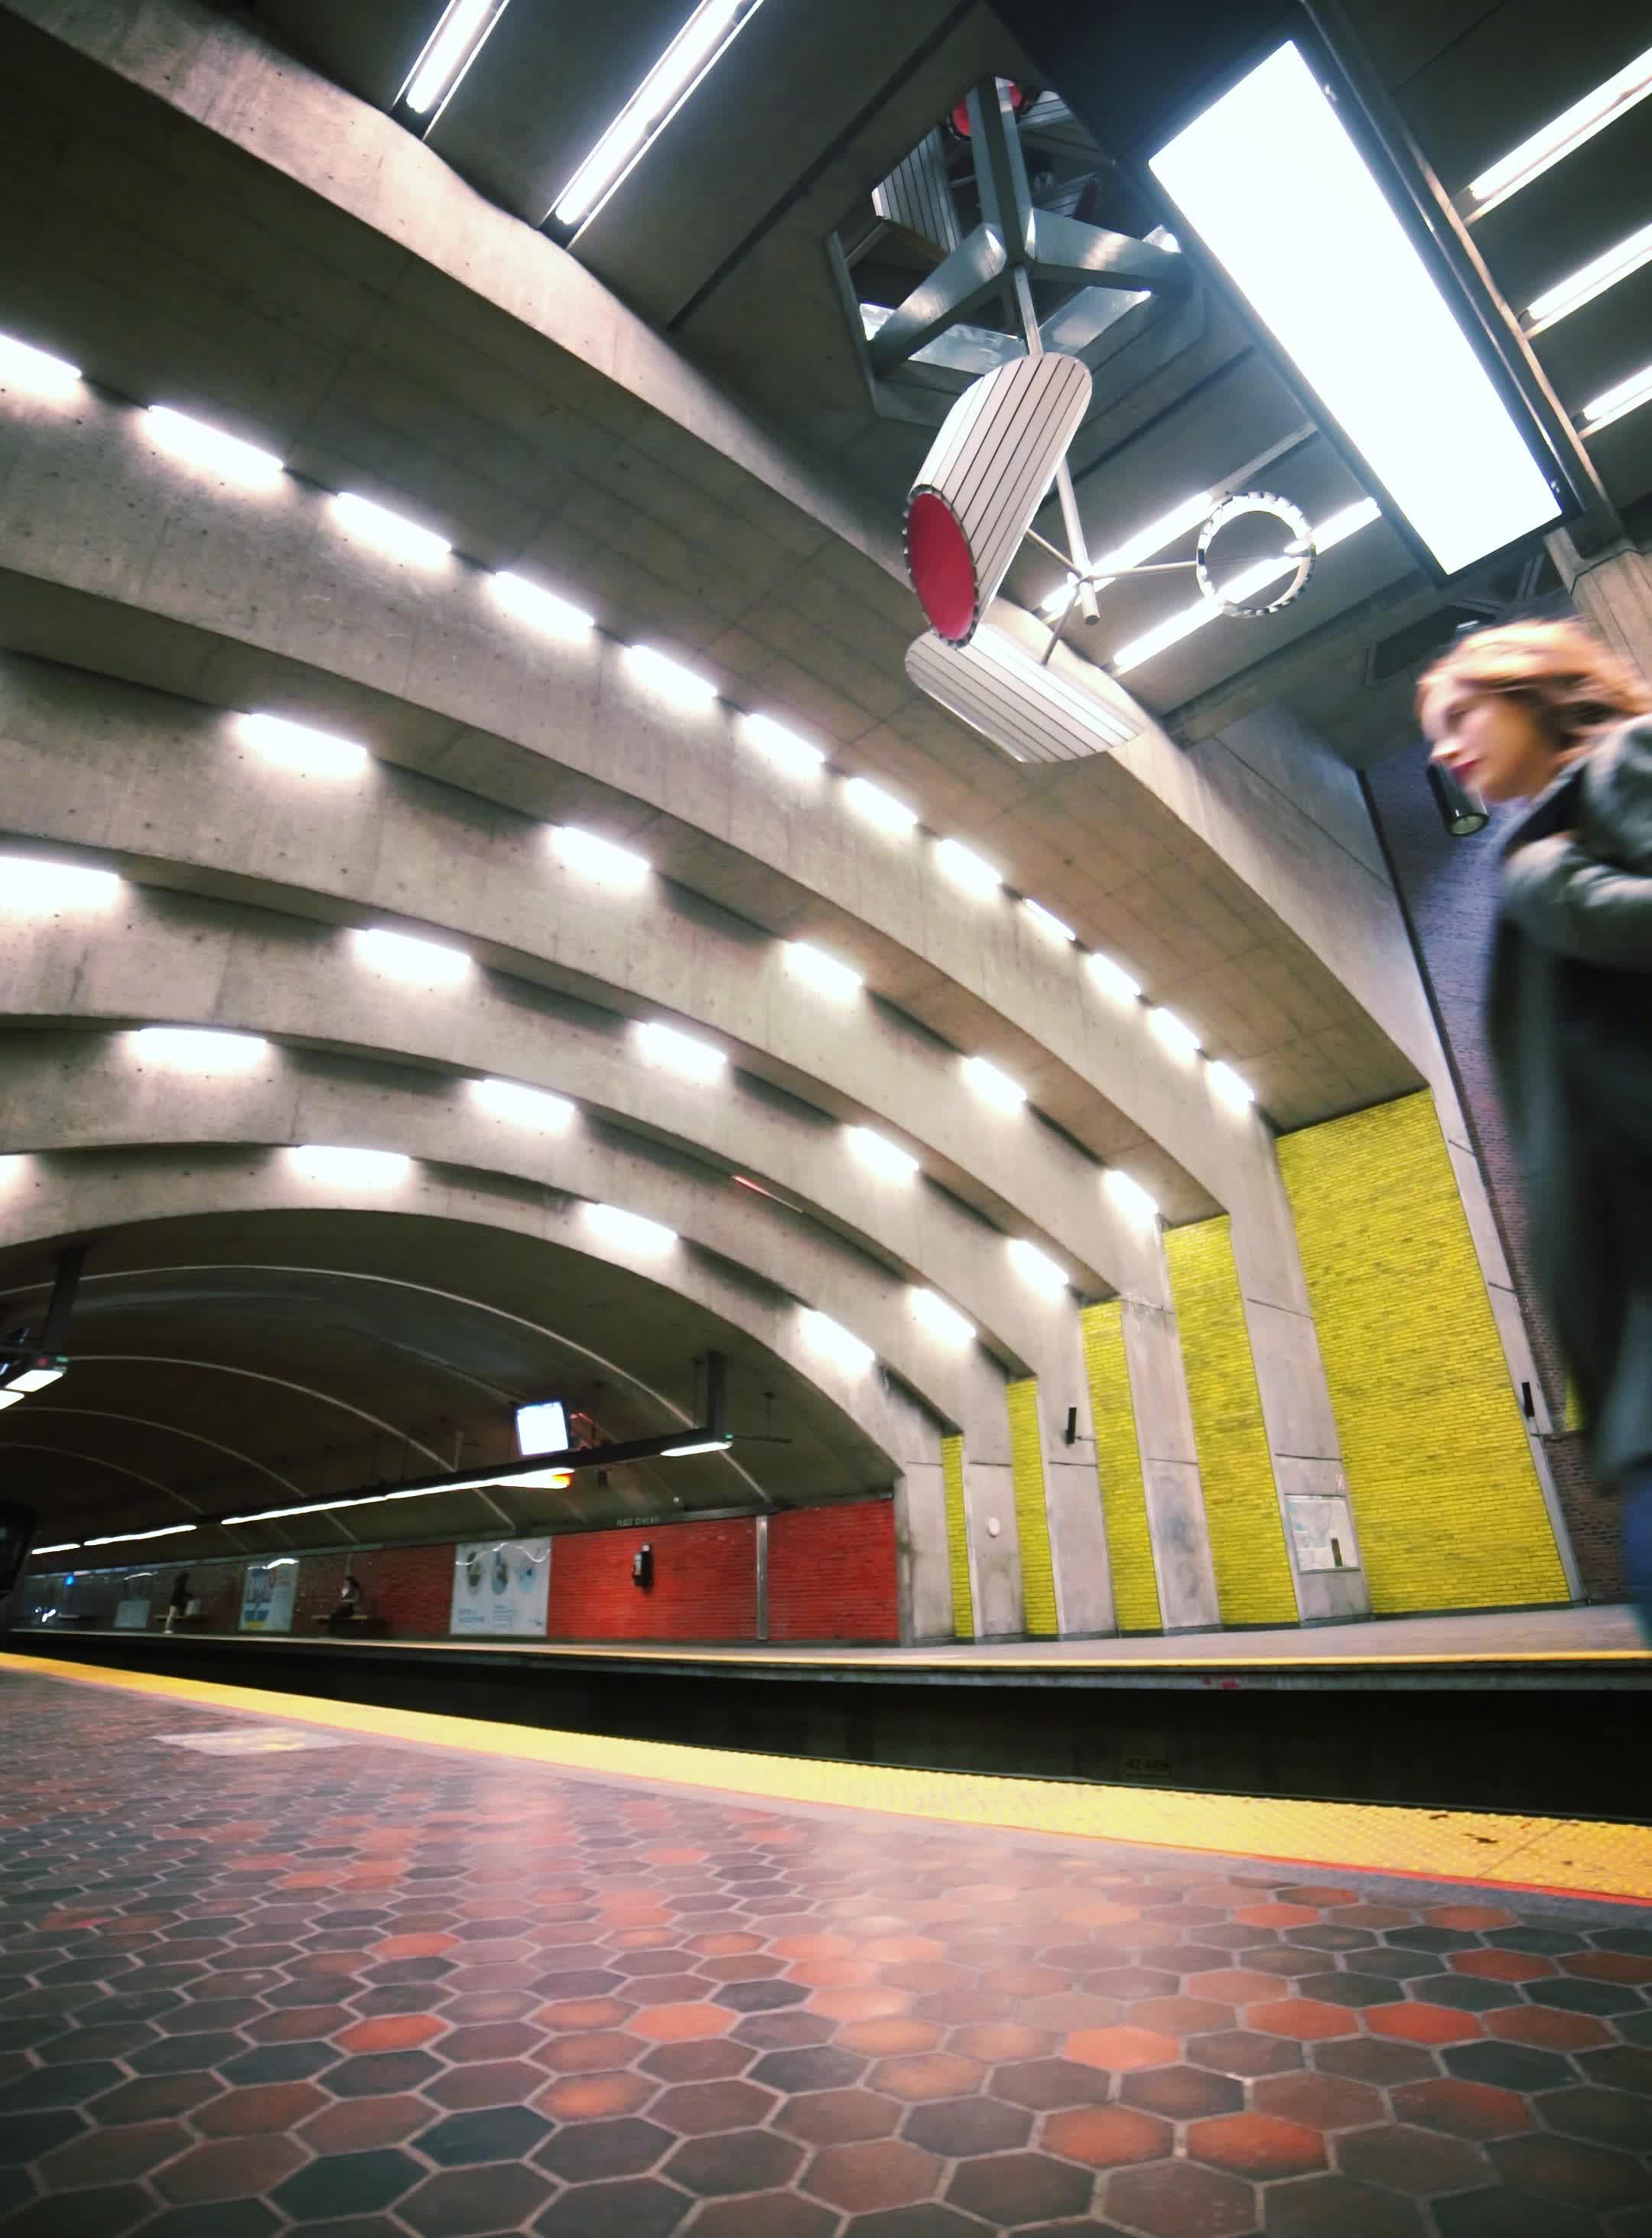 Montreal Metro Loop #4 GIFs